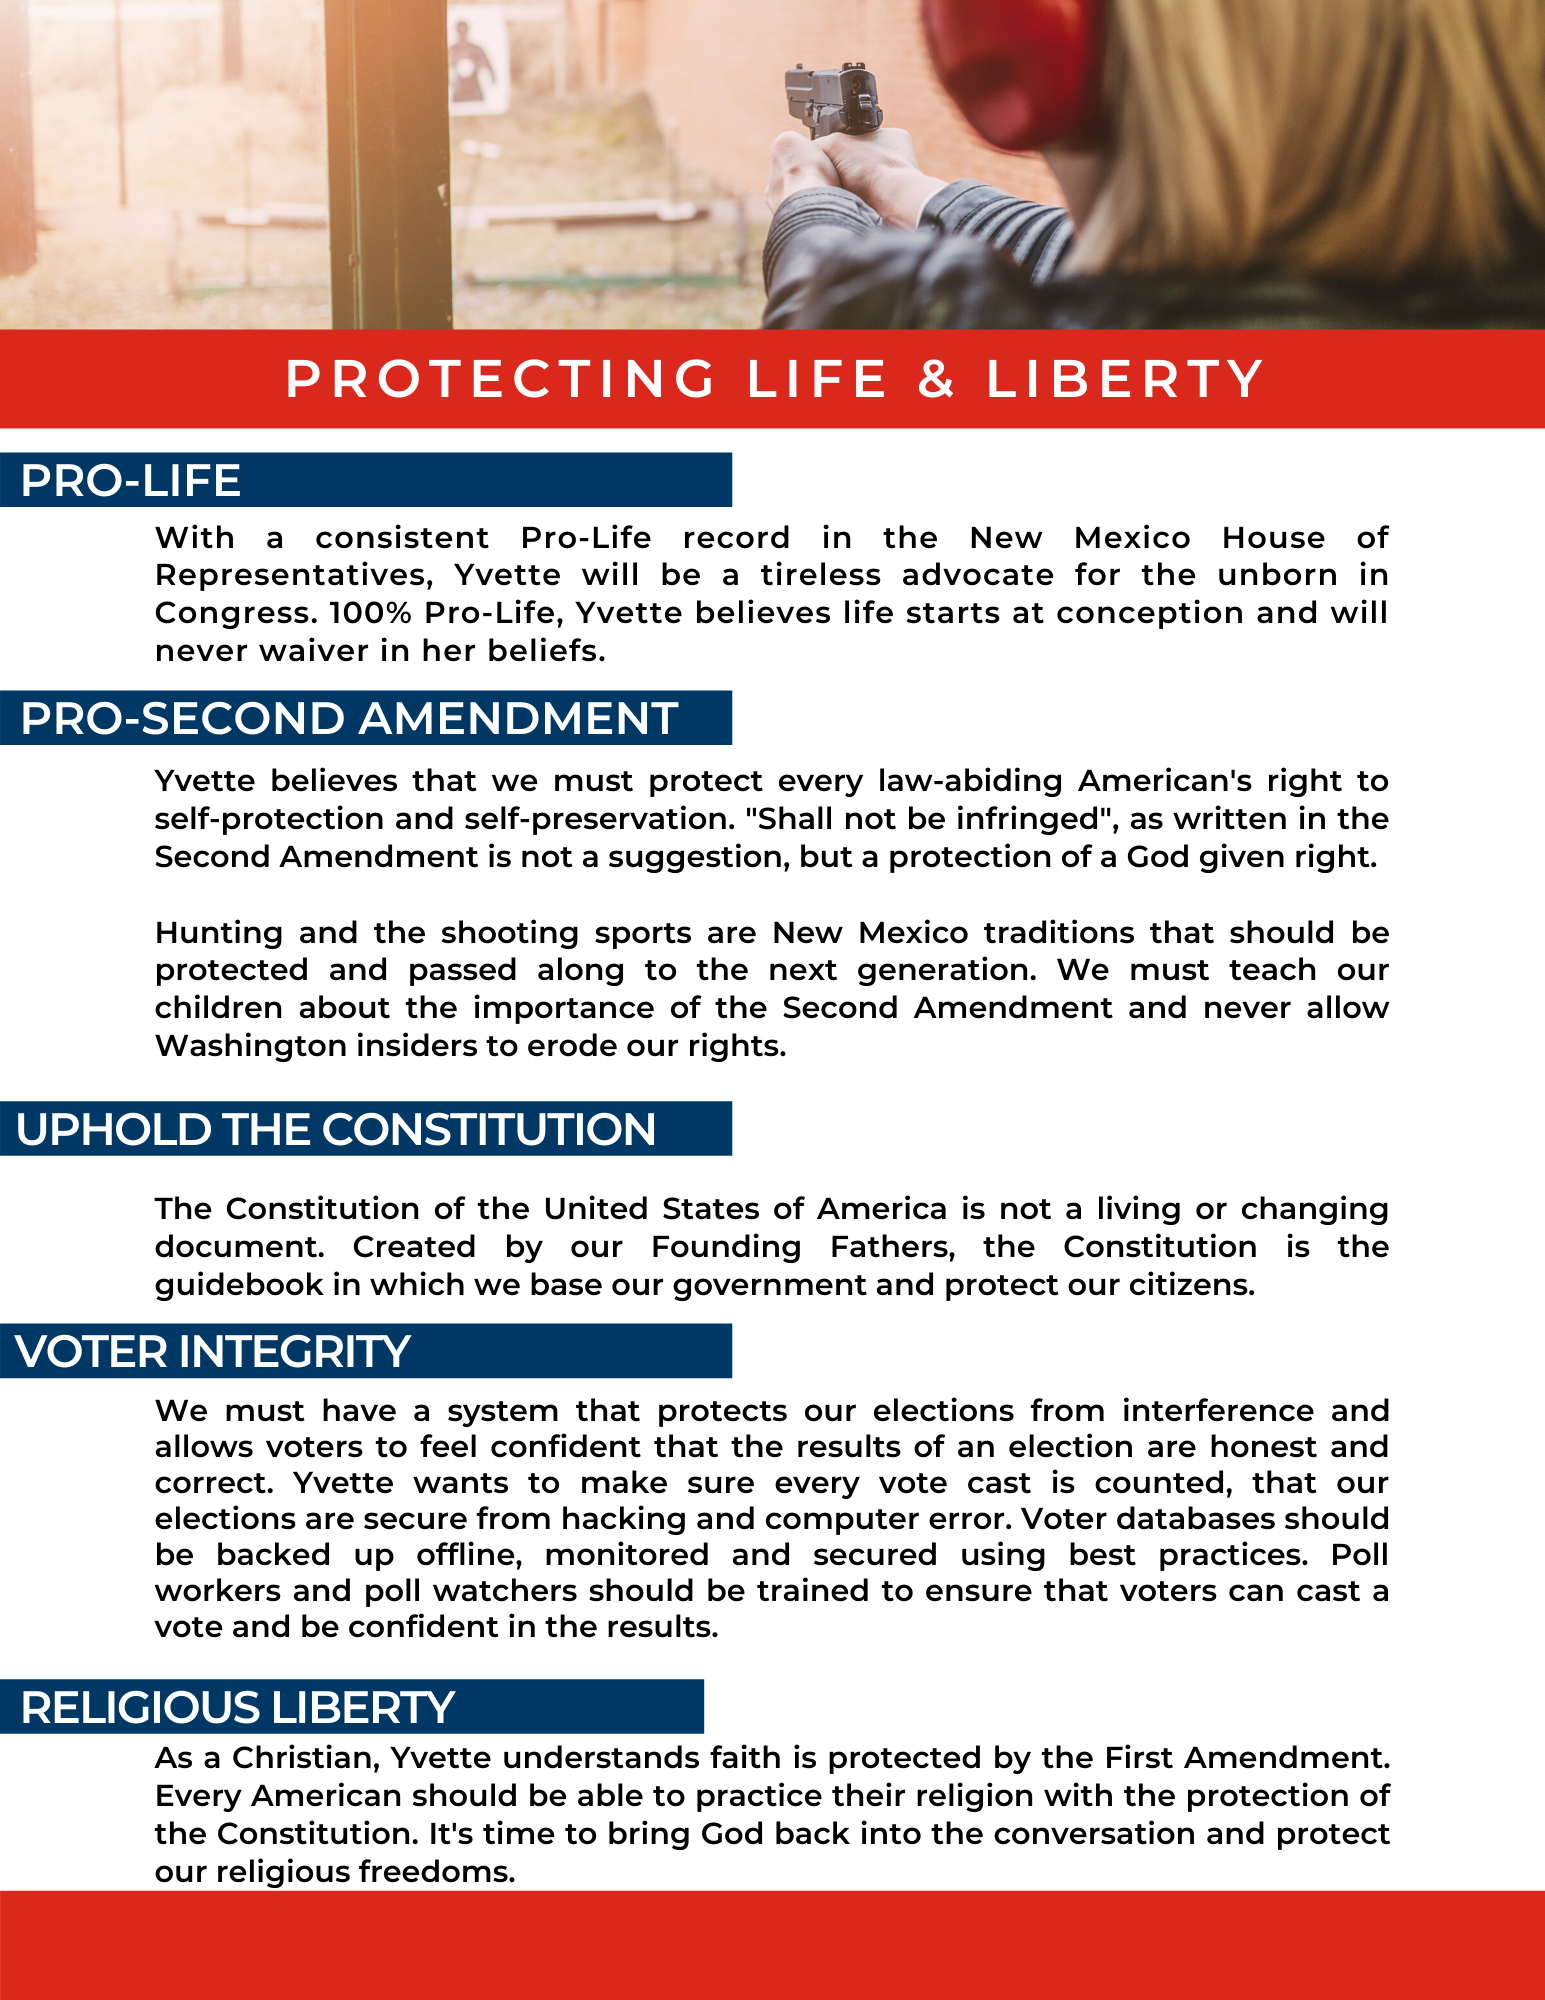 Protecting Life & Liberty